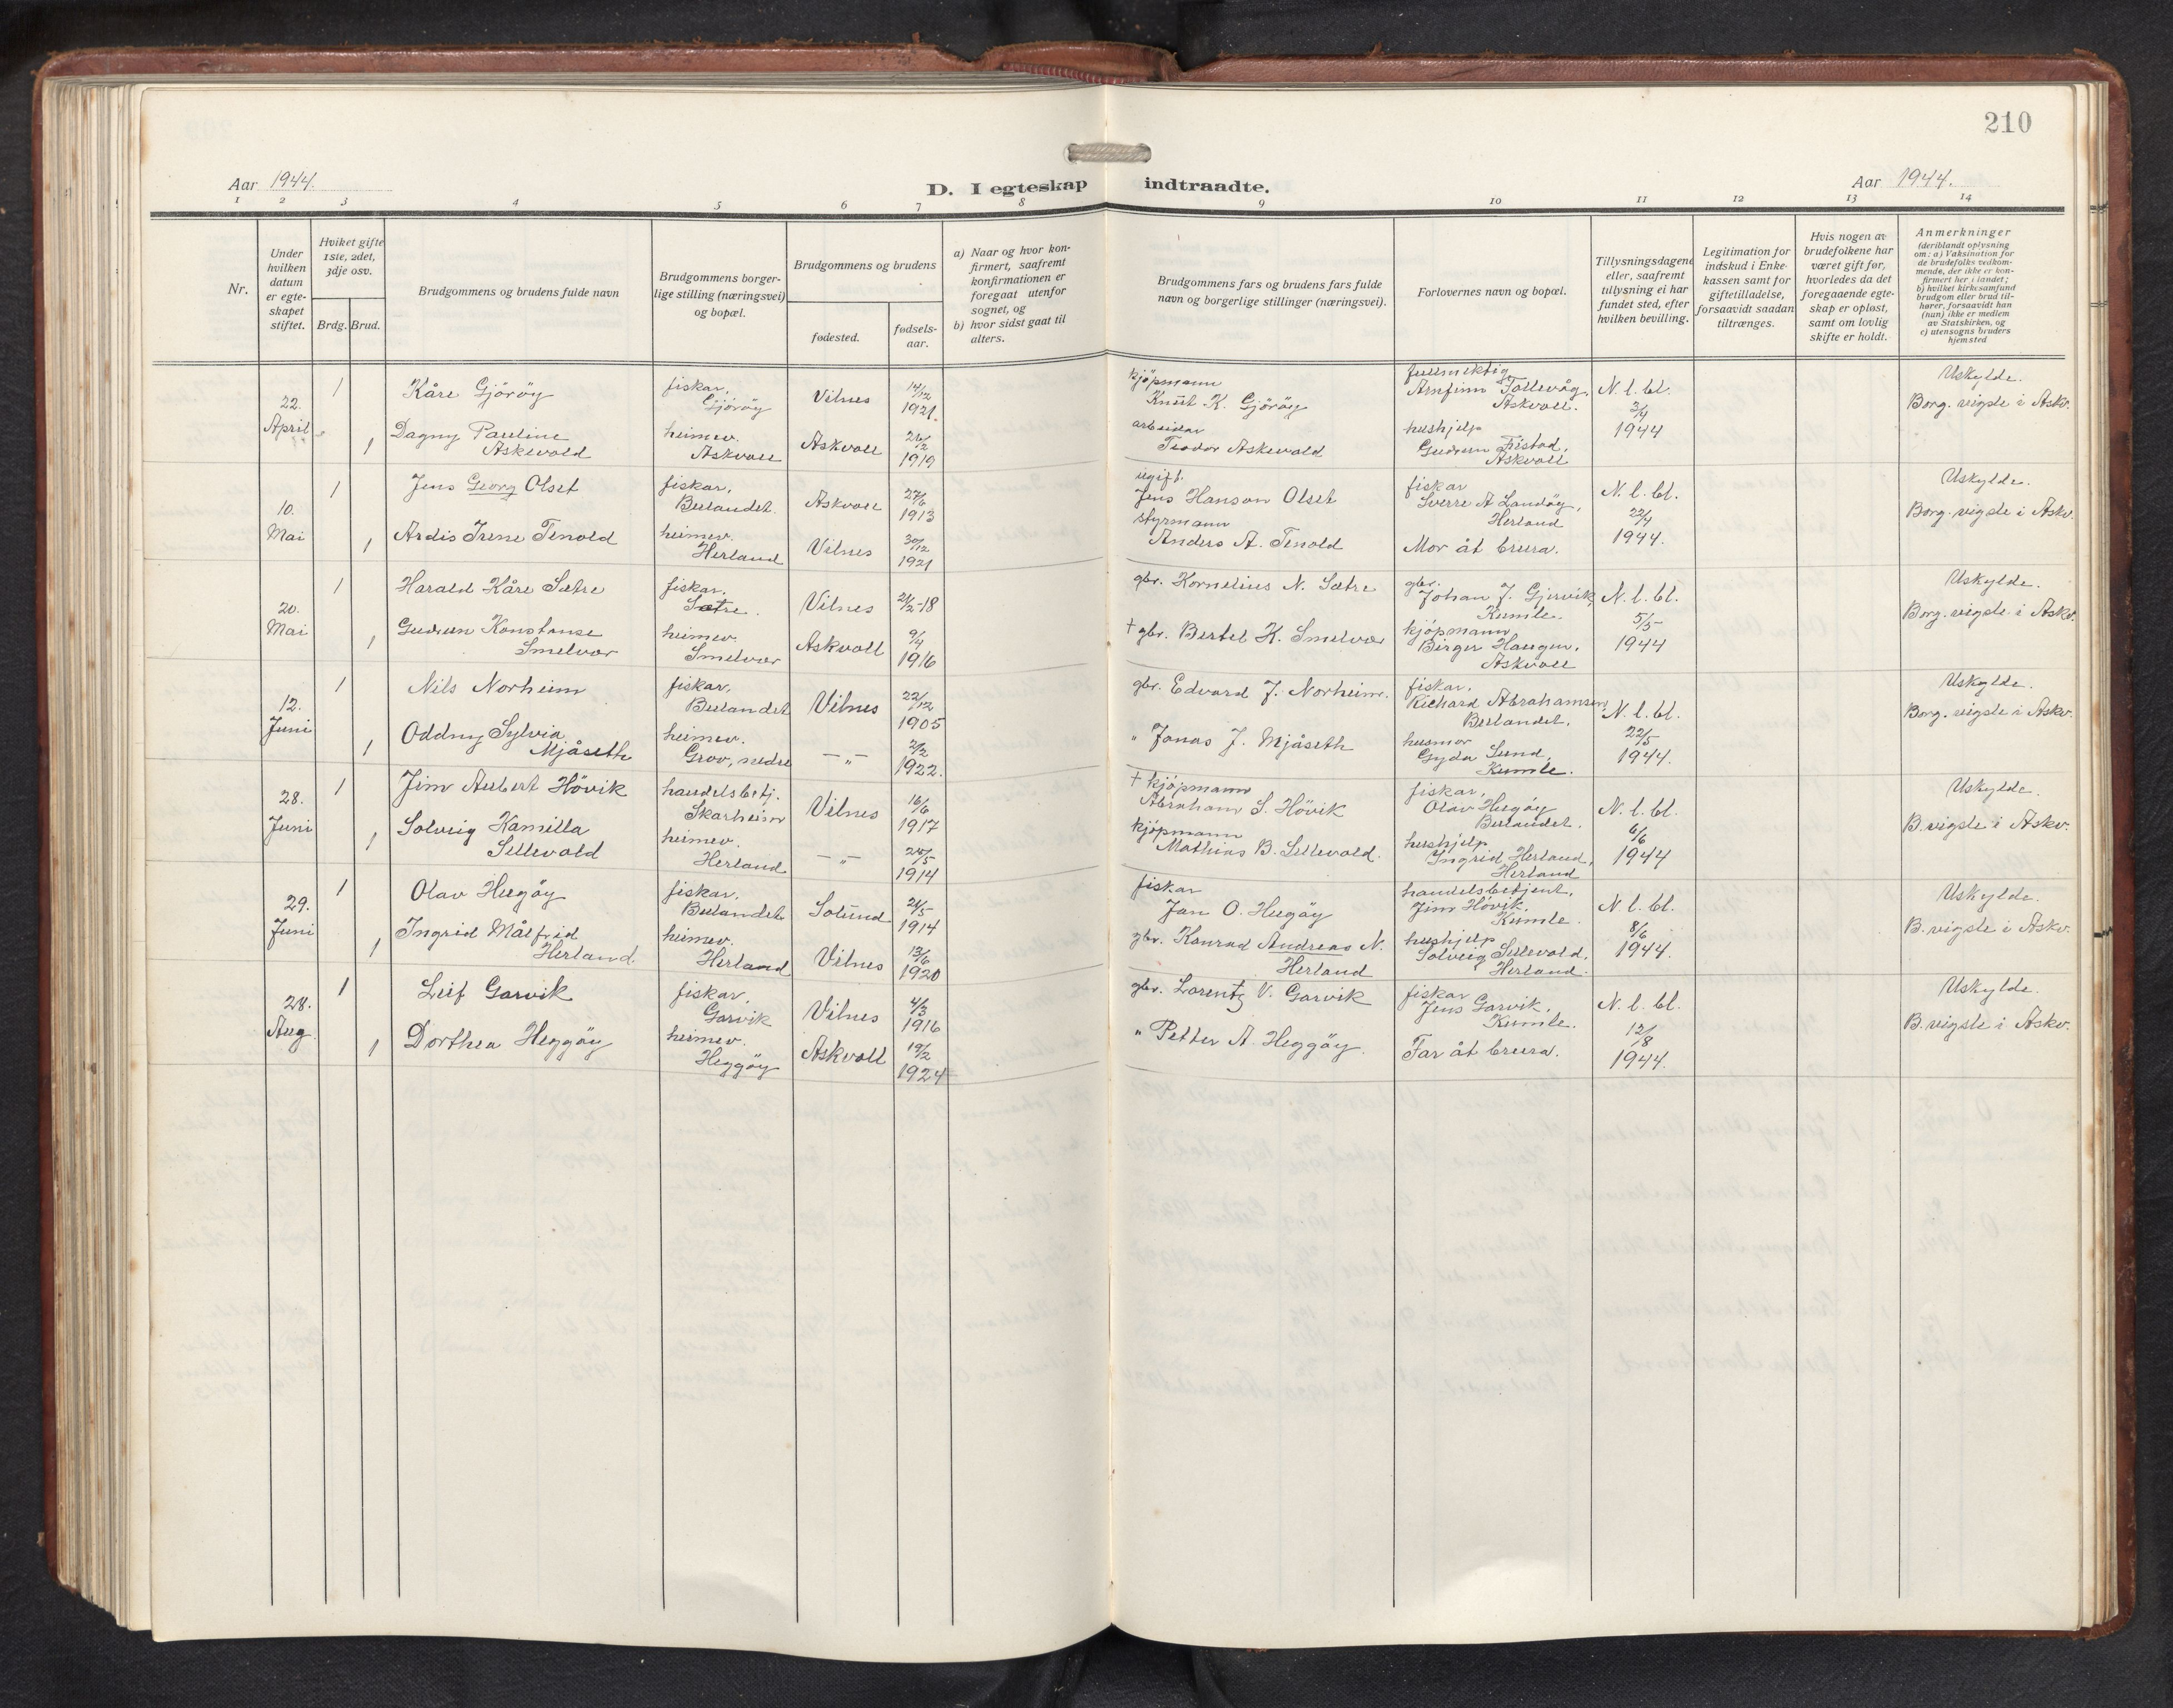 SAB, Askvoll sokneprestembete, H/Hab/Habb/L0002: Klokkerbok nr. B 2, 1910-1947, s. 209b-210a